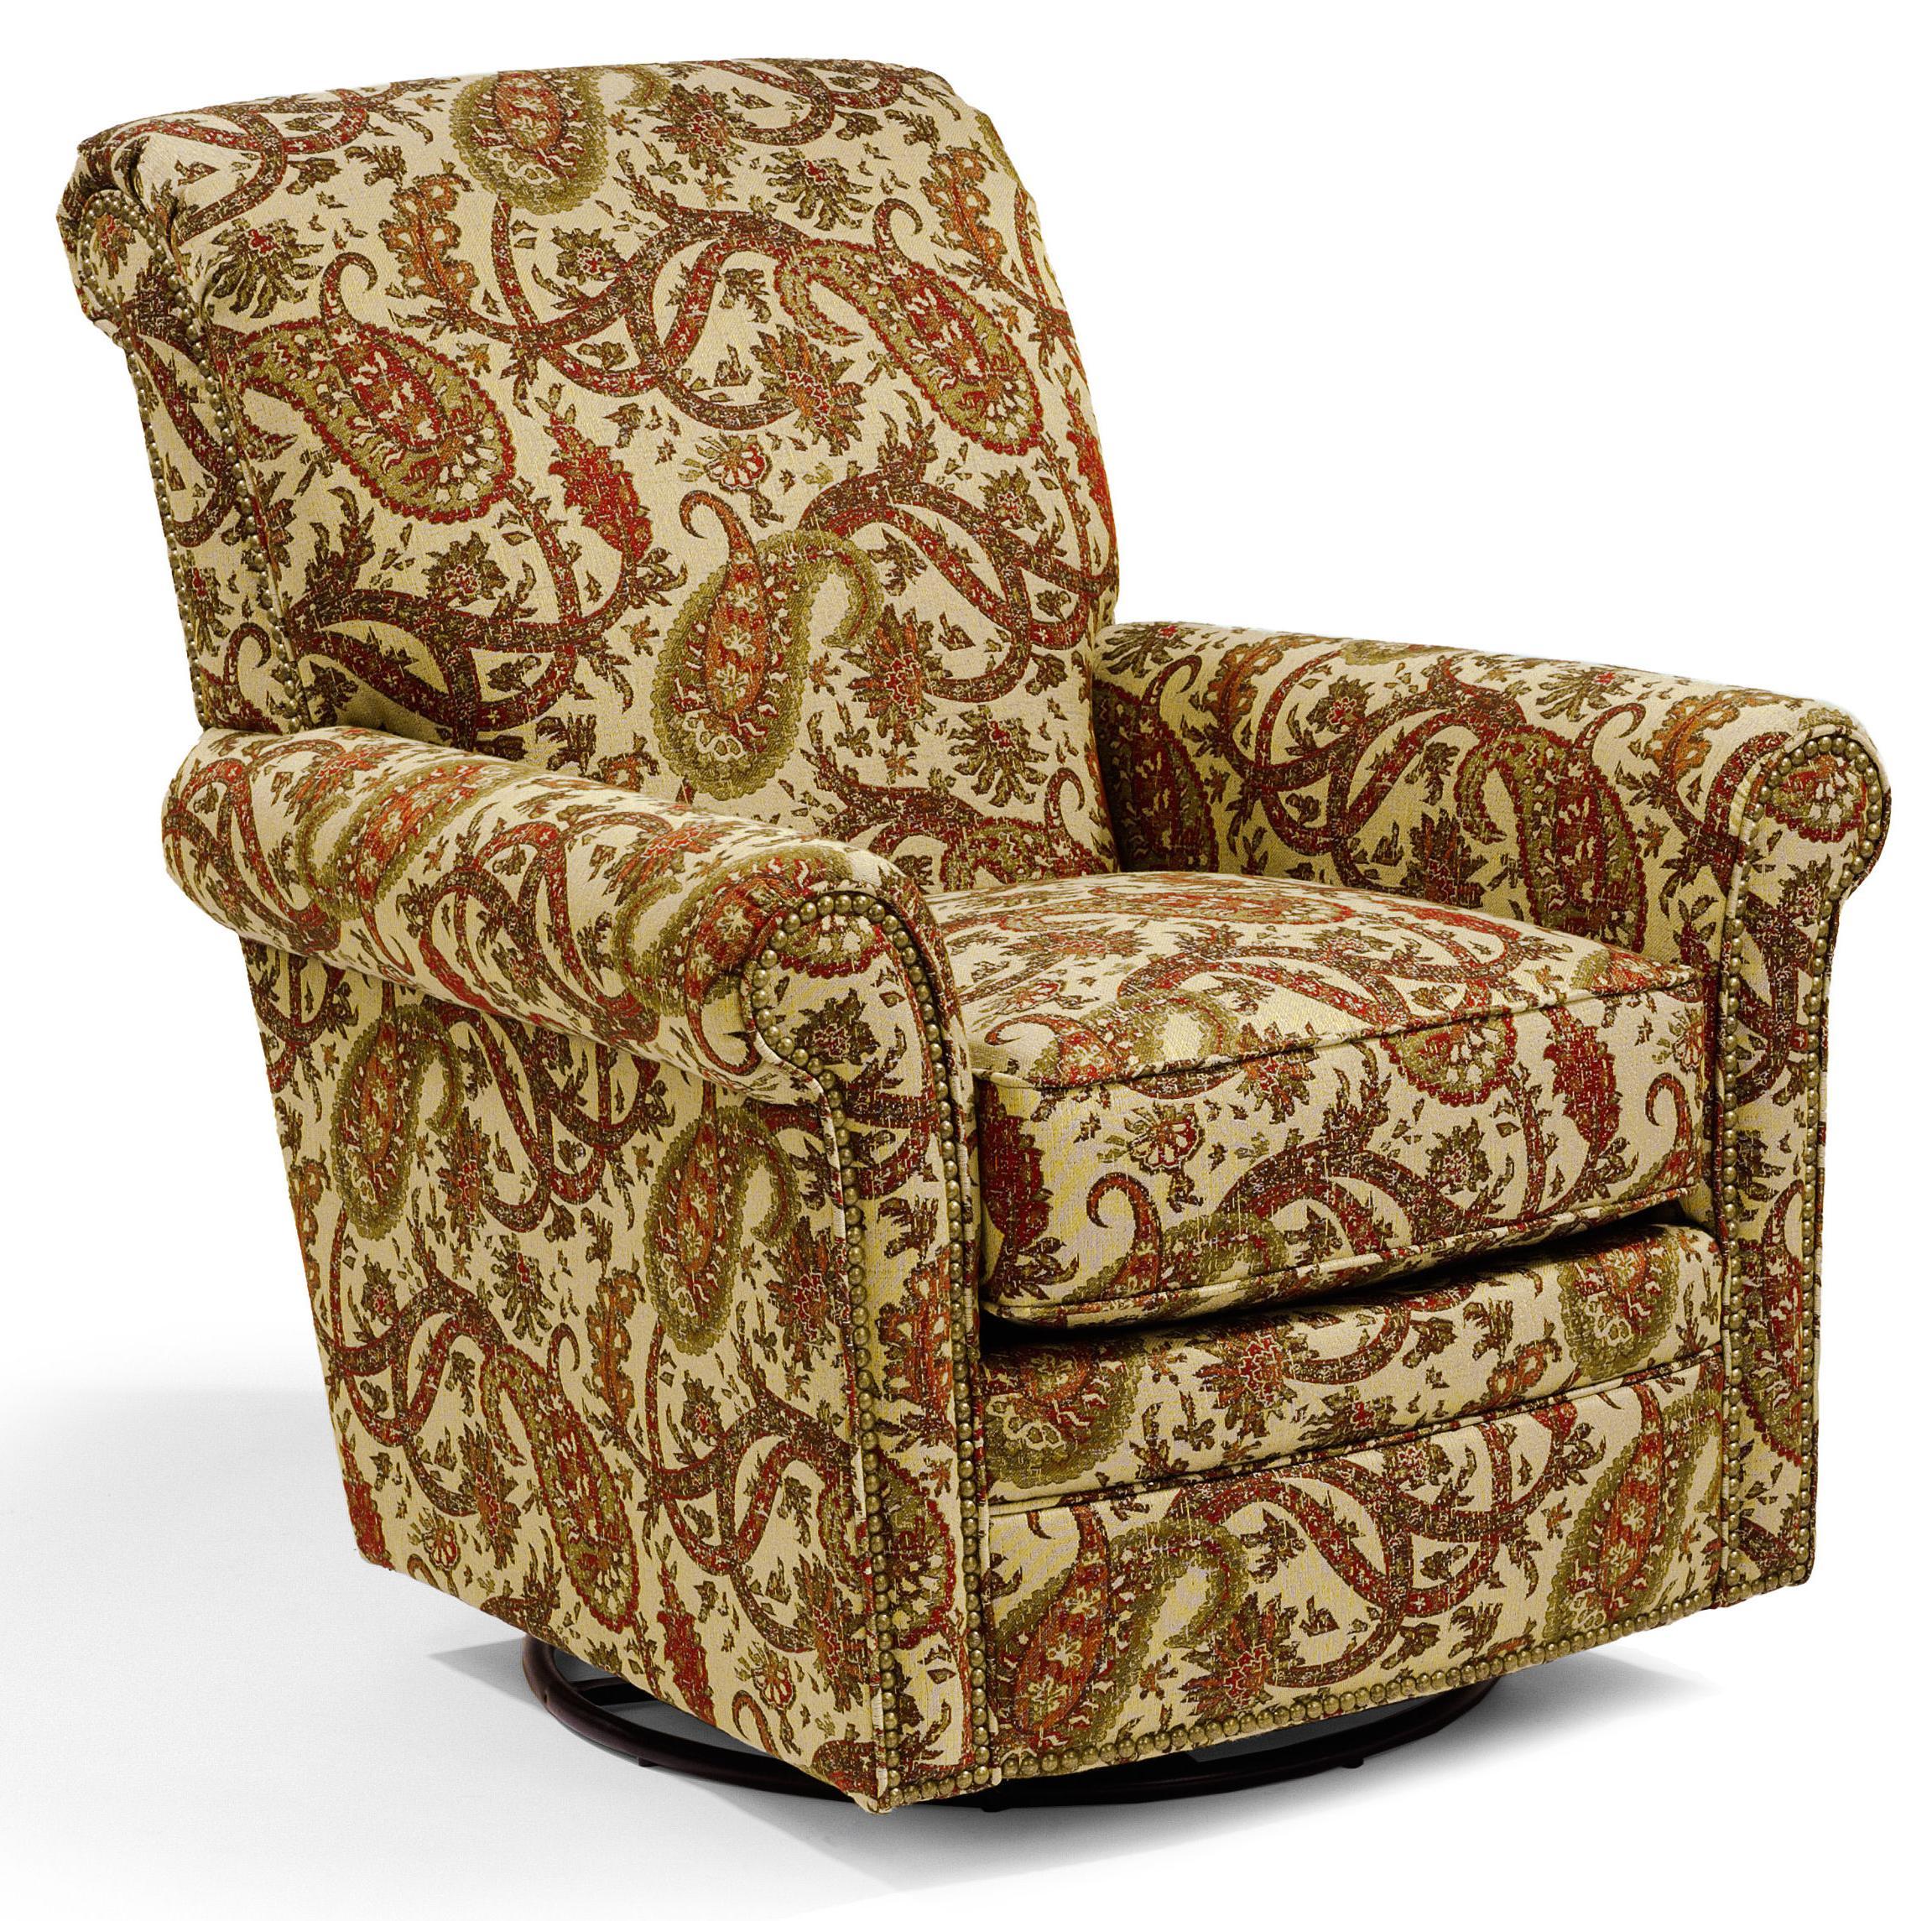 best chairs geneva glider weight limit target childrens chair flexsteel accents plaza swivel with nailhead trim